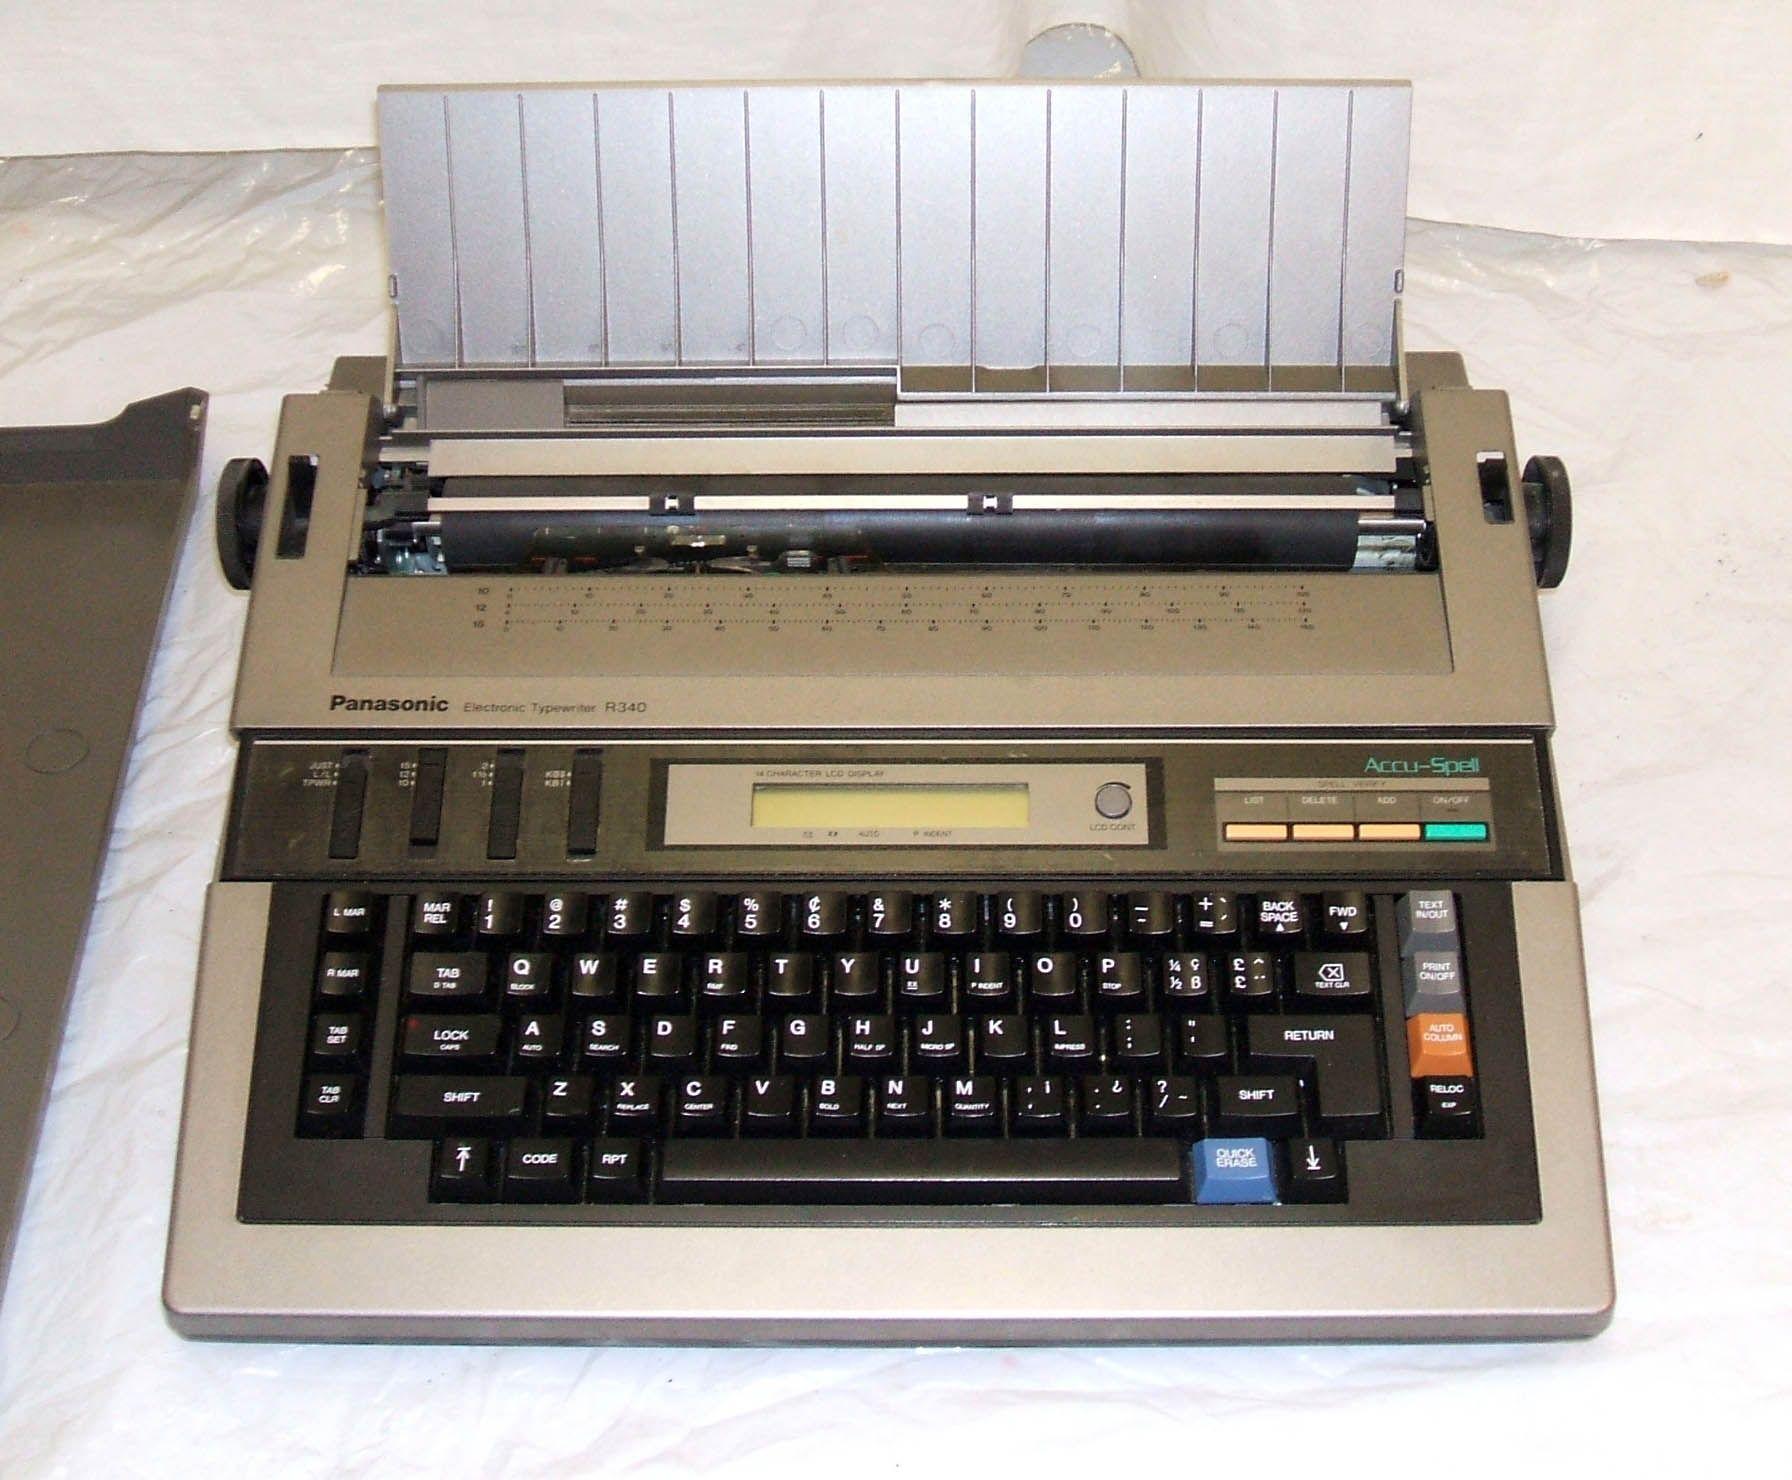 panasonic electric typewriter office equipment vintage mostly rh pinterest com KX Typewriter Panasonic E700m KX Typewriter Panasonic E700m